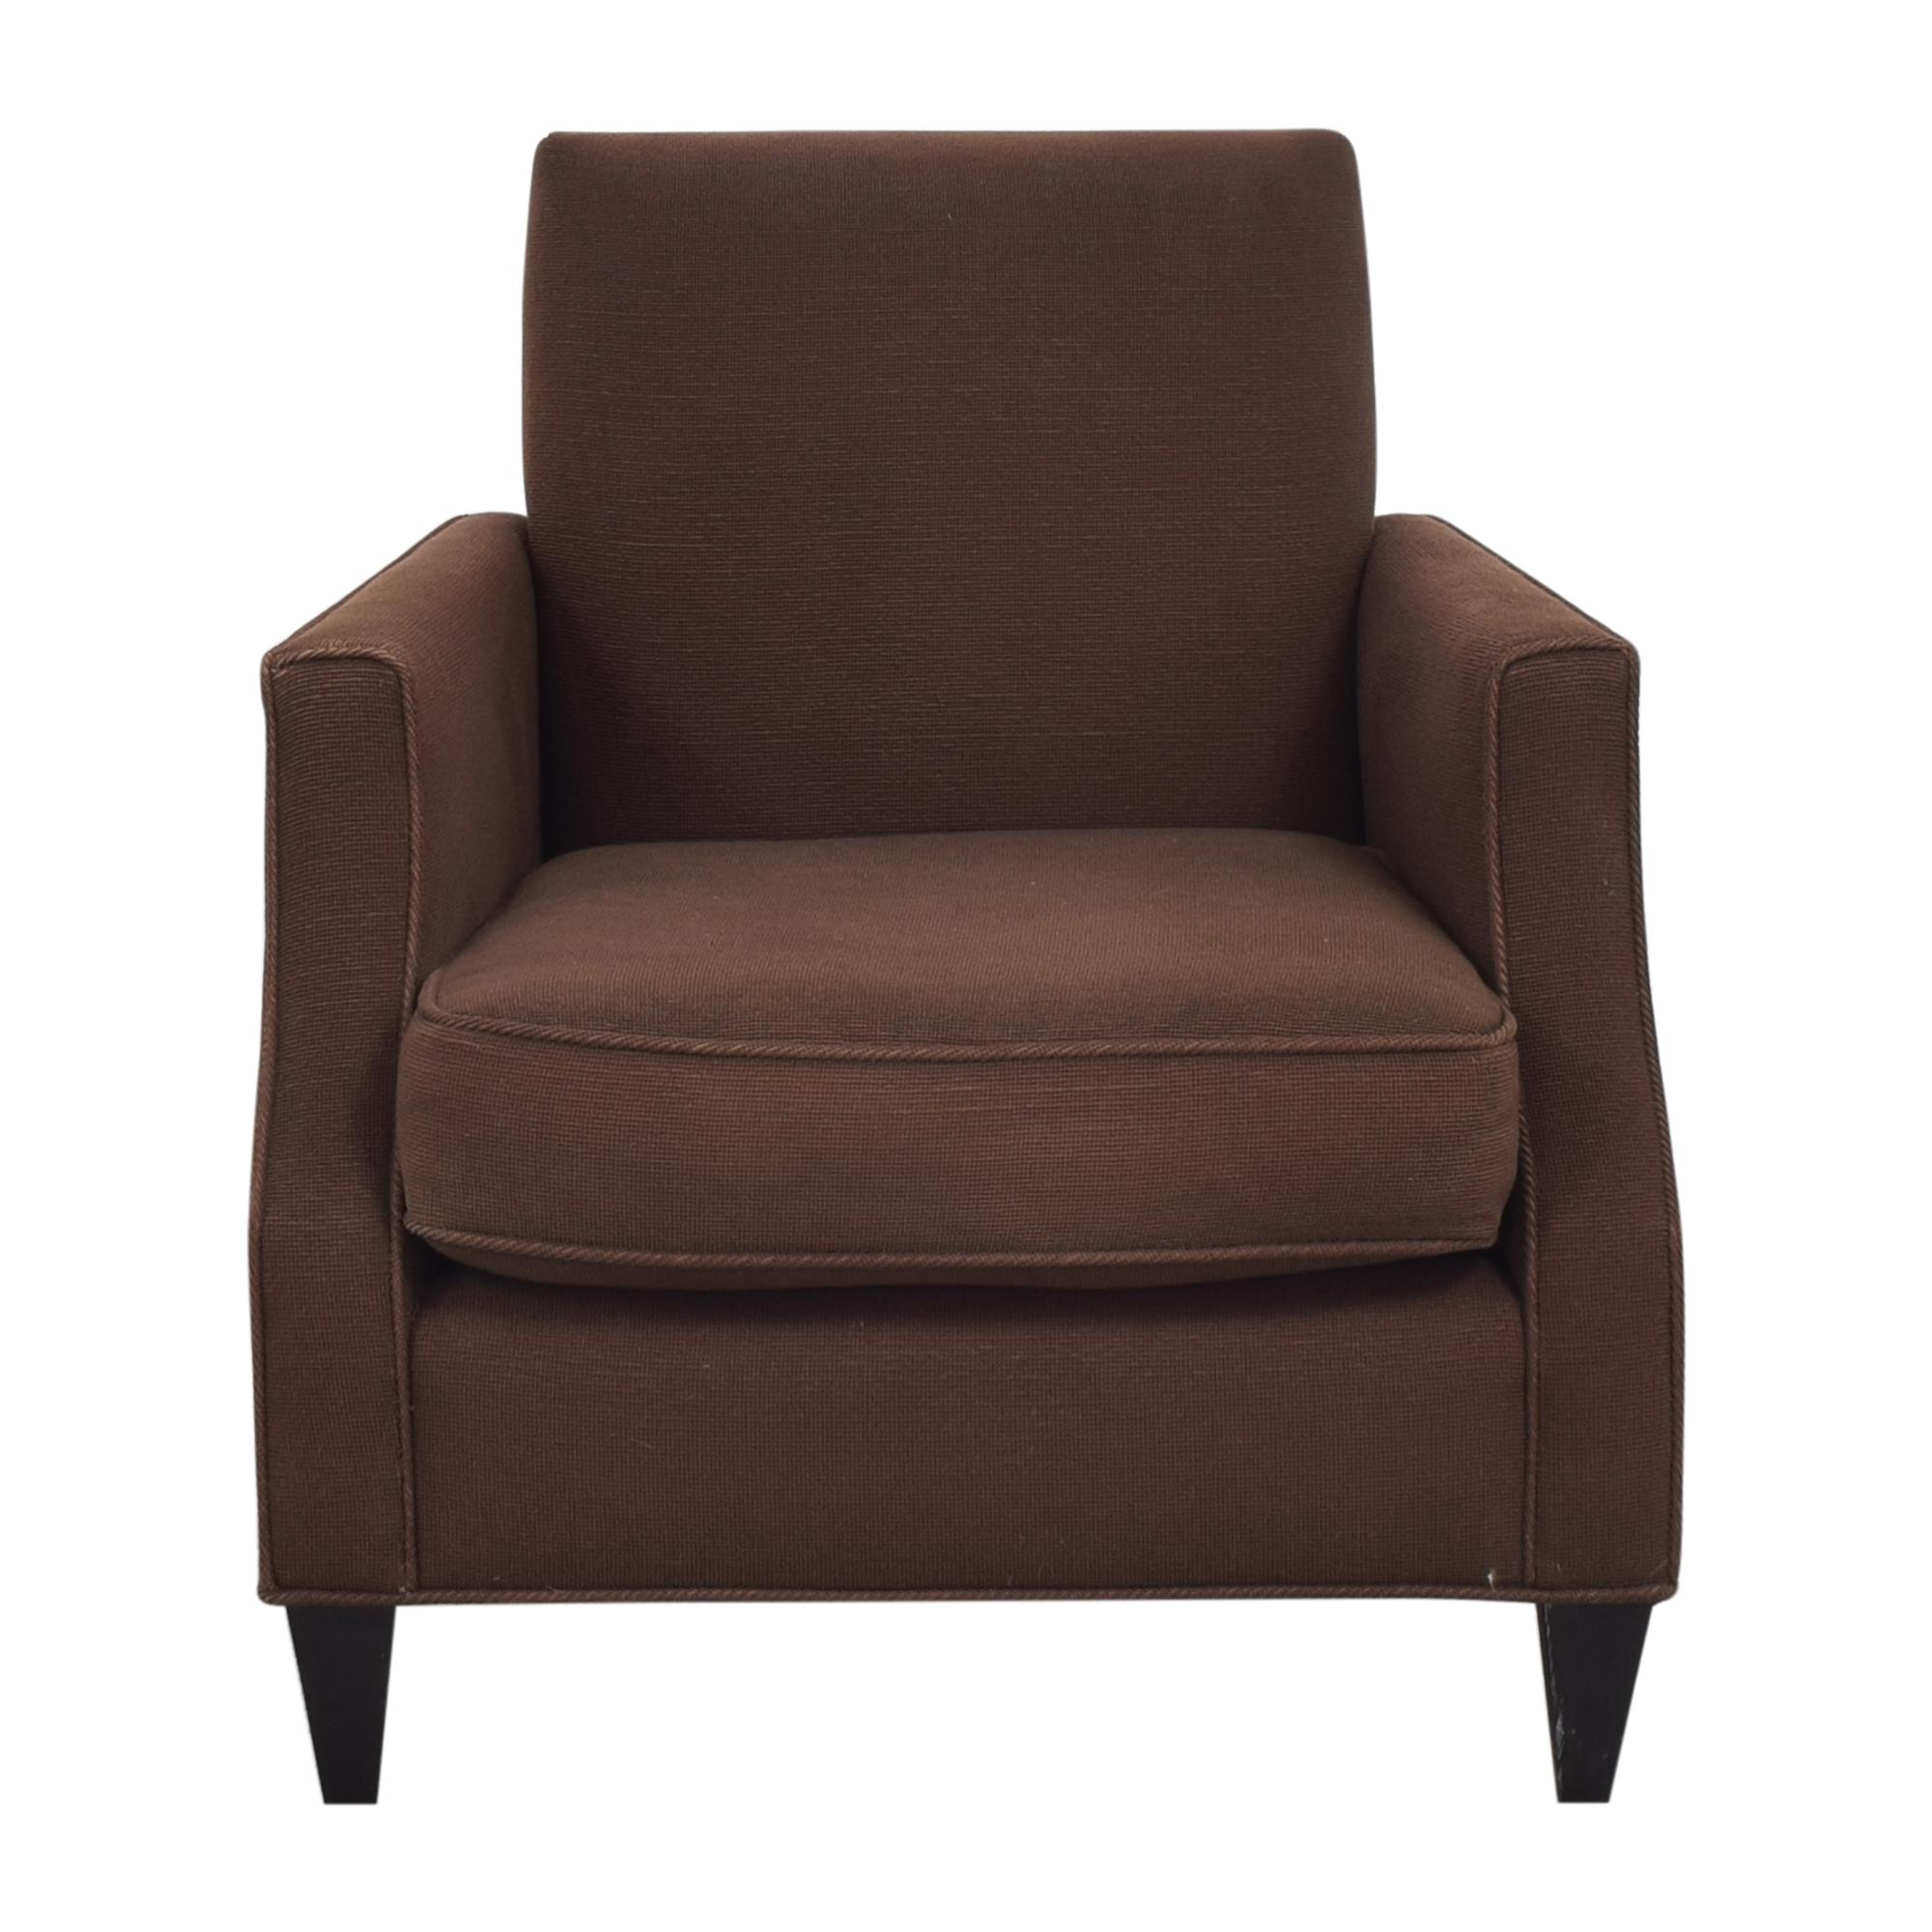 Crate & Barrel Crate & Barrel Fabric Arm Chair ct